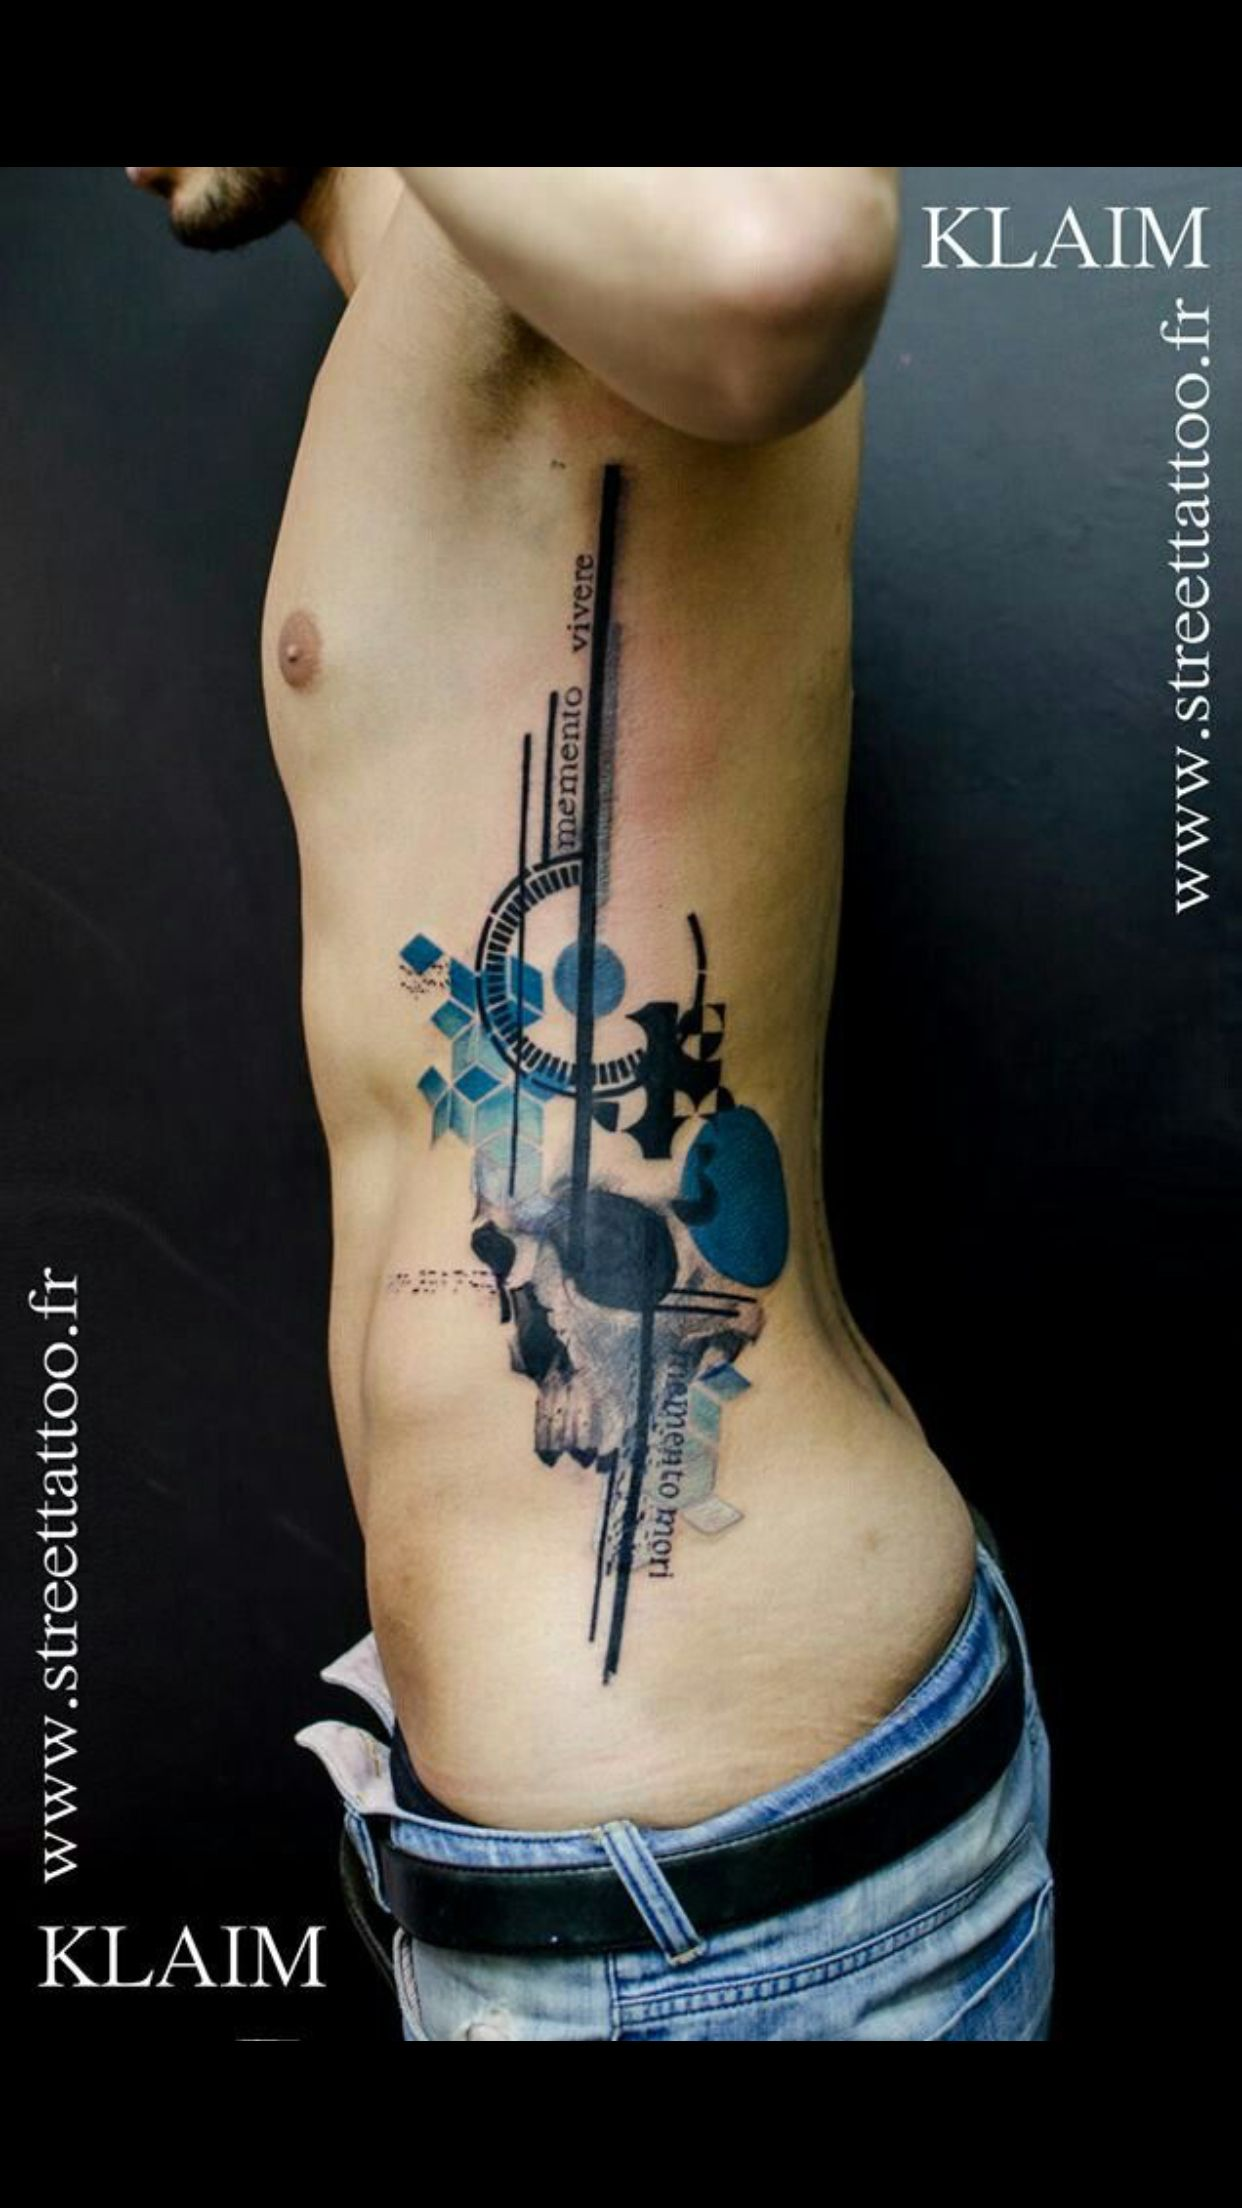 Nuances De Bleu Tattoos Tattoos Tech Tattoo Cool